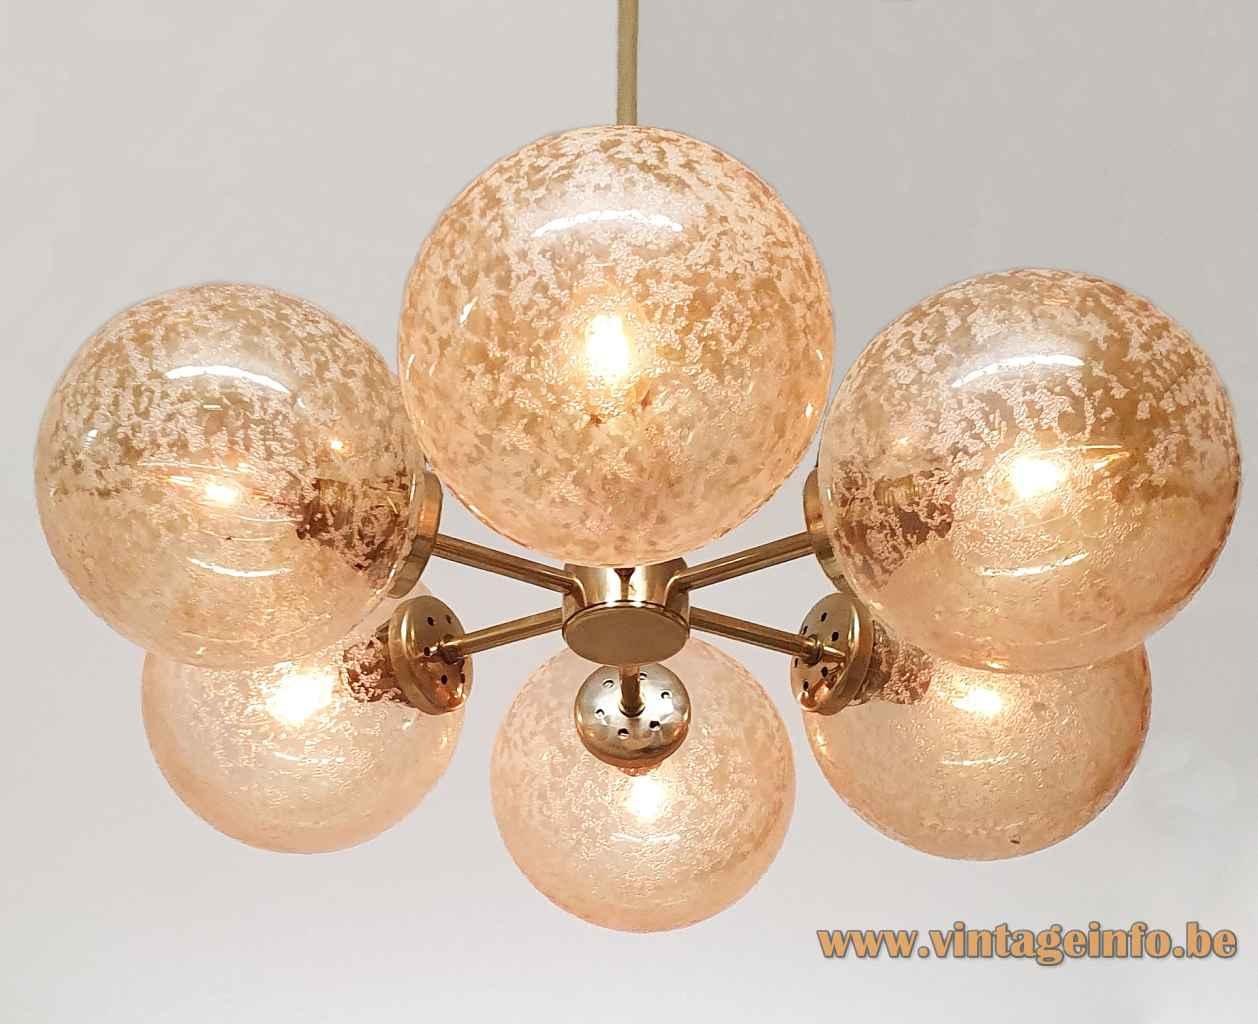 Kaiser Leuchten crackle globes chandelier round smoked glass lampshades brass sputnik rods 1970s 1980s Germany